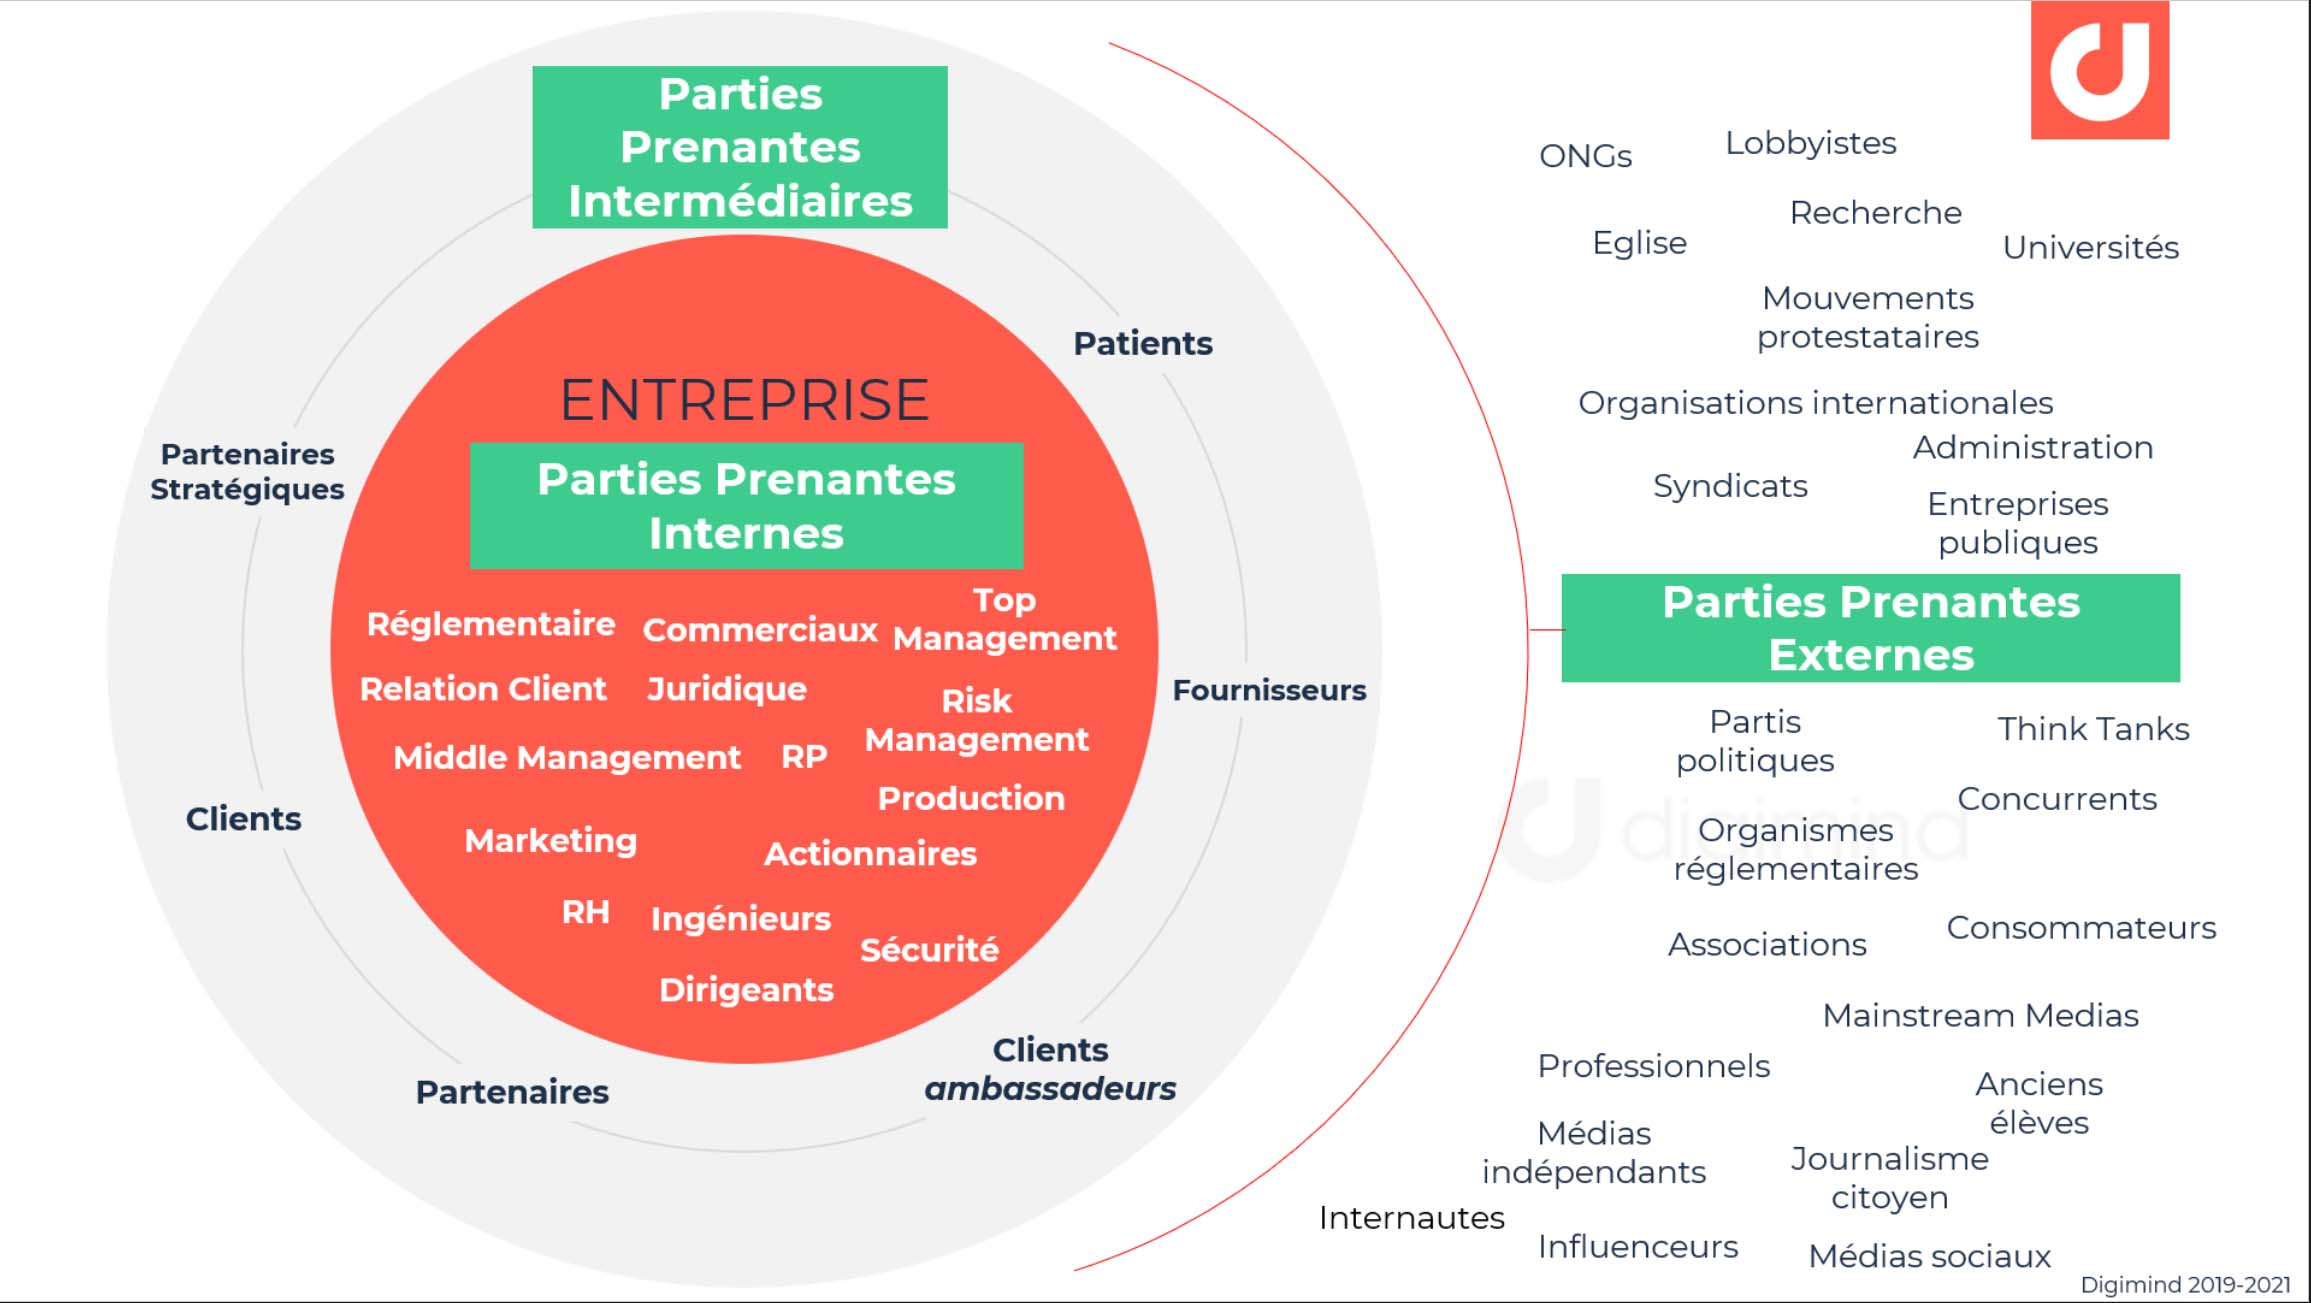 Schéma de cartographies des parties prenantes